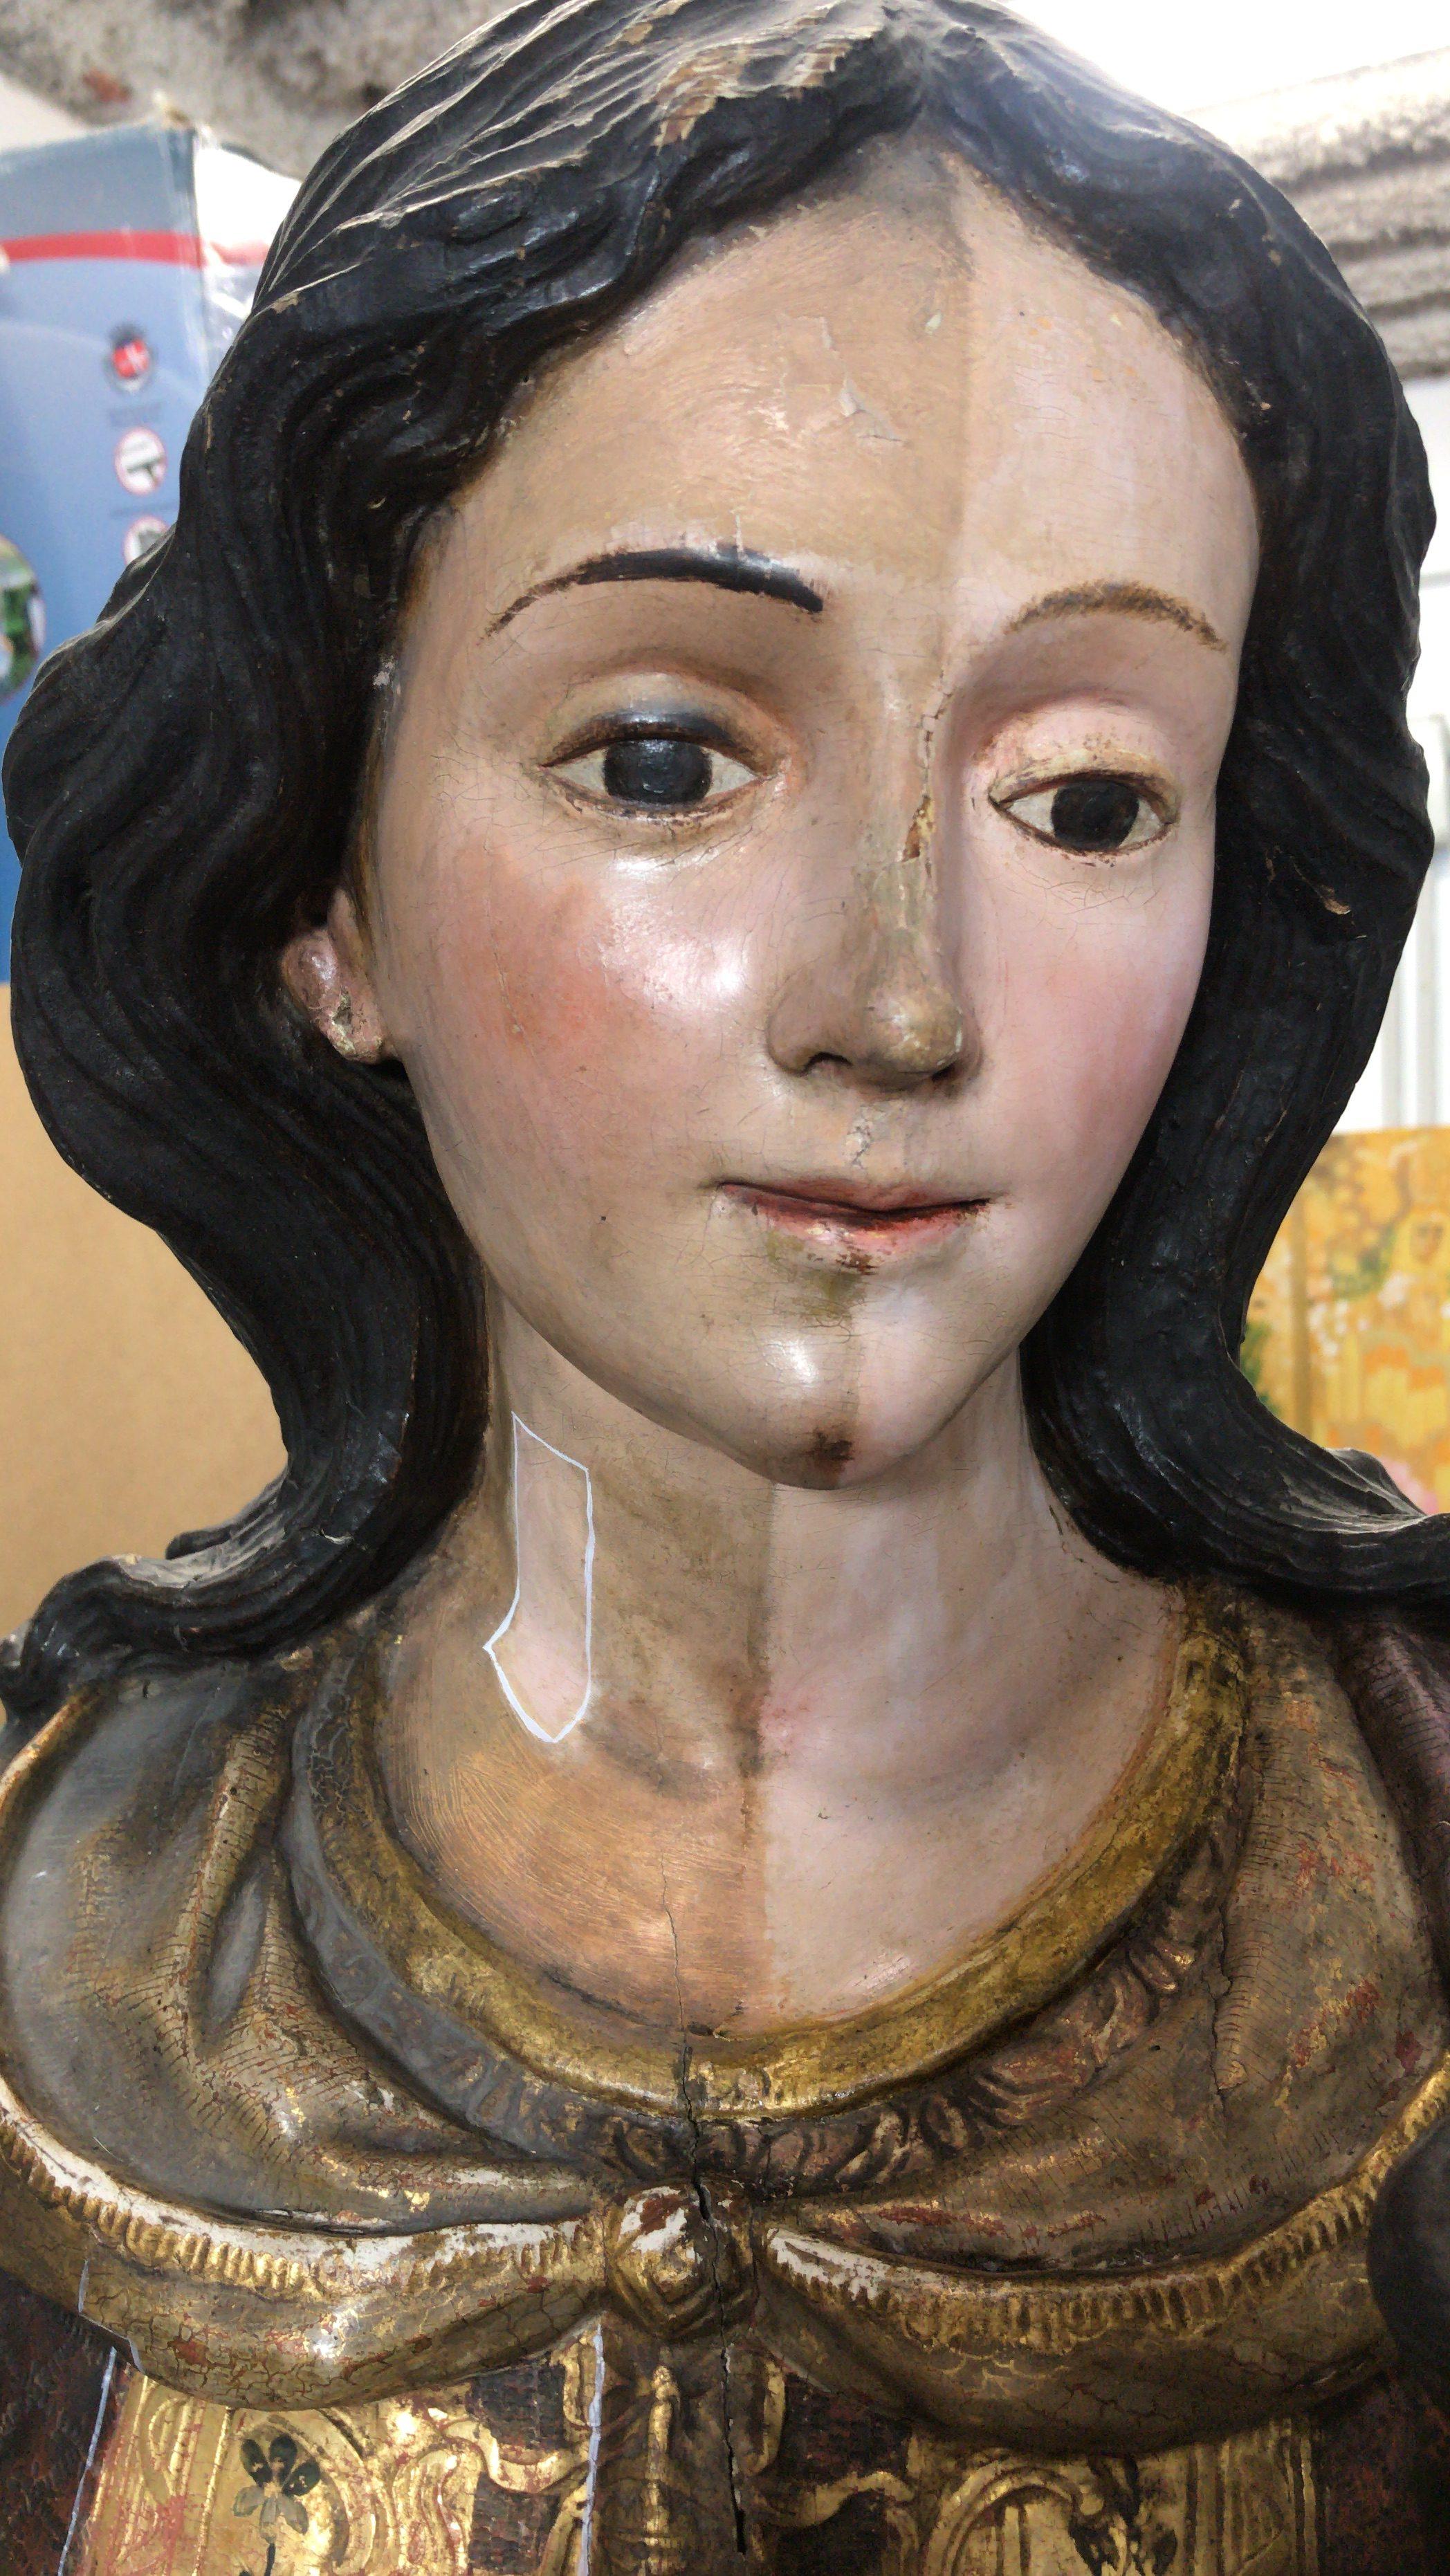 restauracion.v.rosario.sanjacinto.11